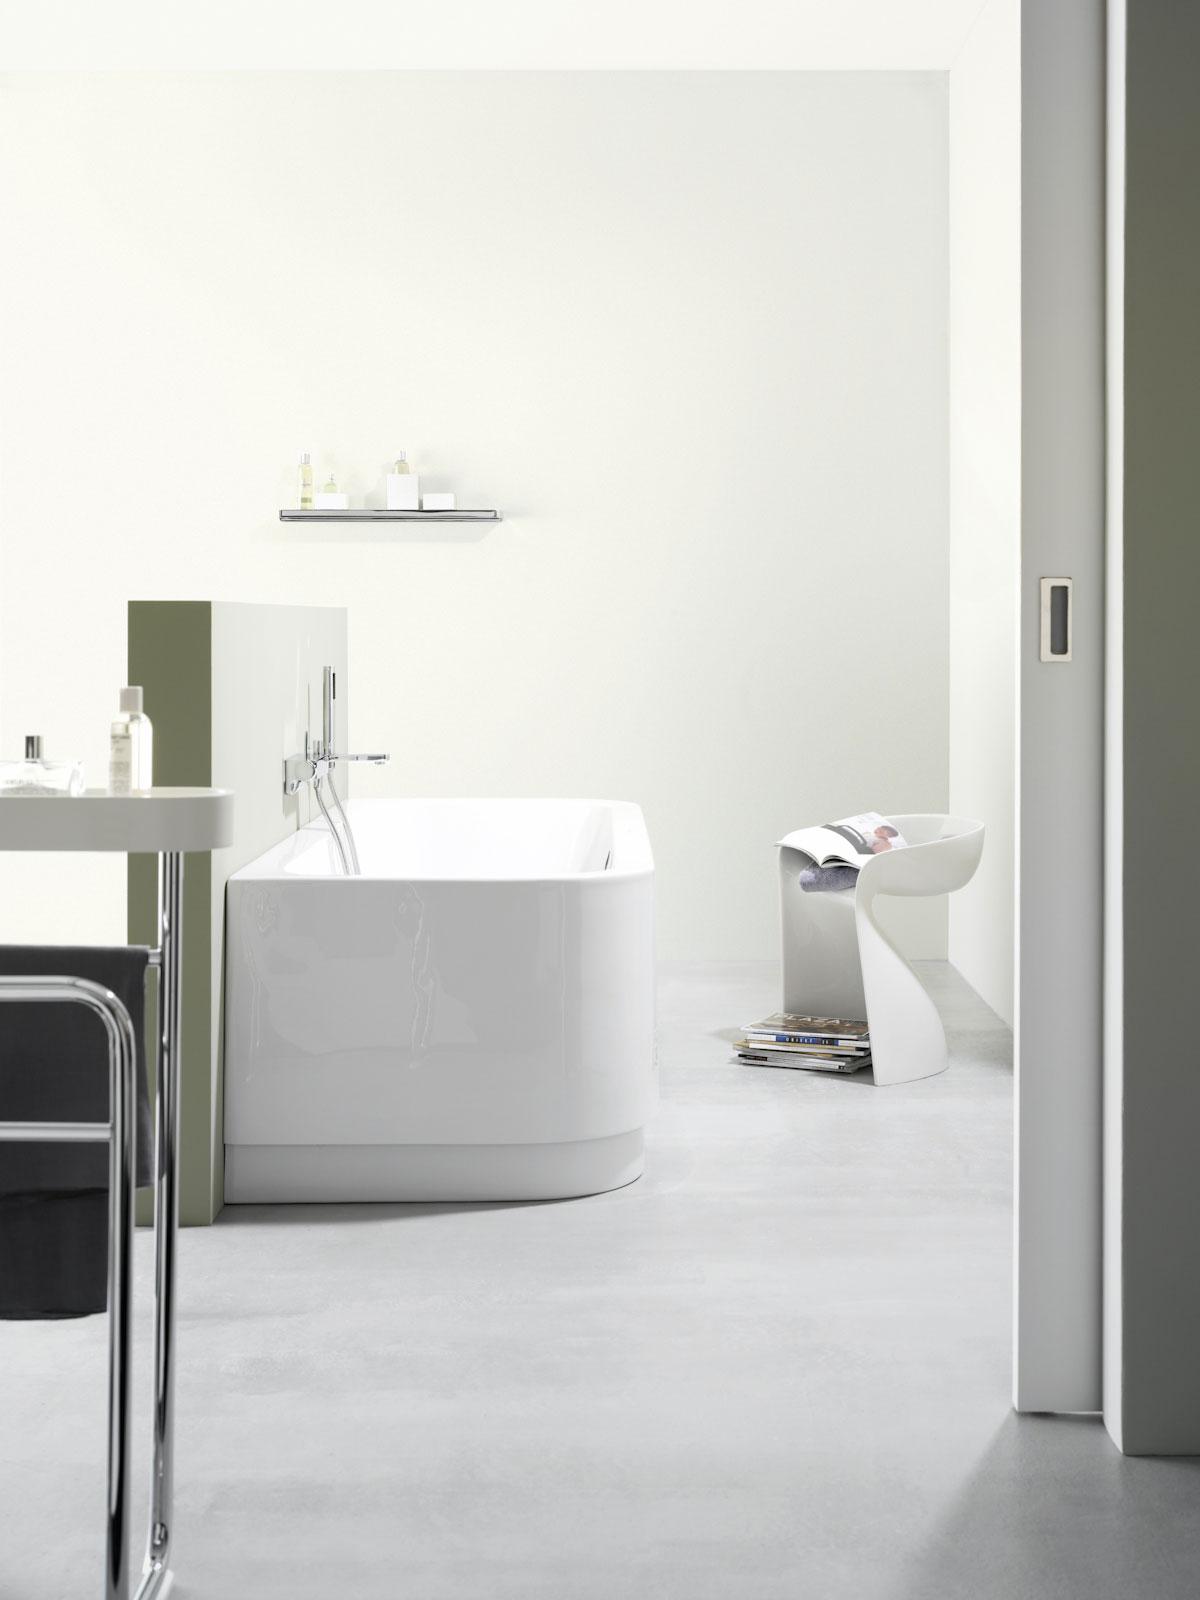 Bath Fittings Amp Accessories From Dornbracht